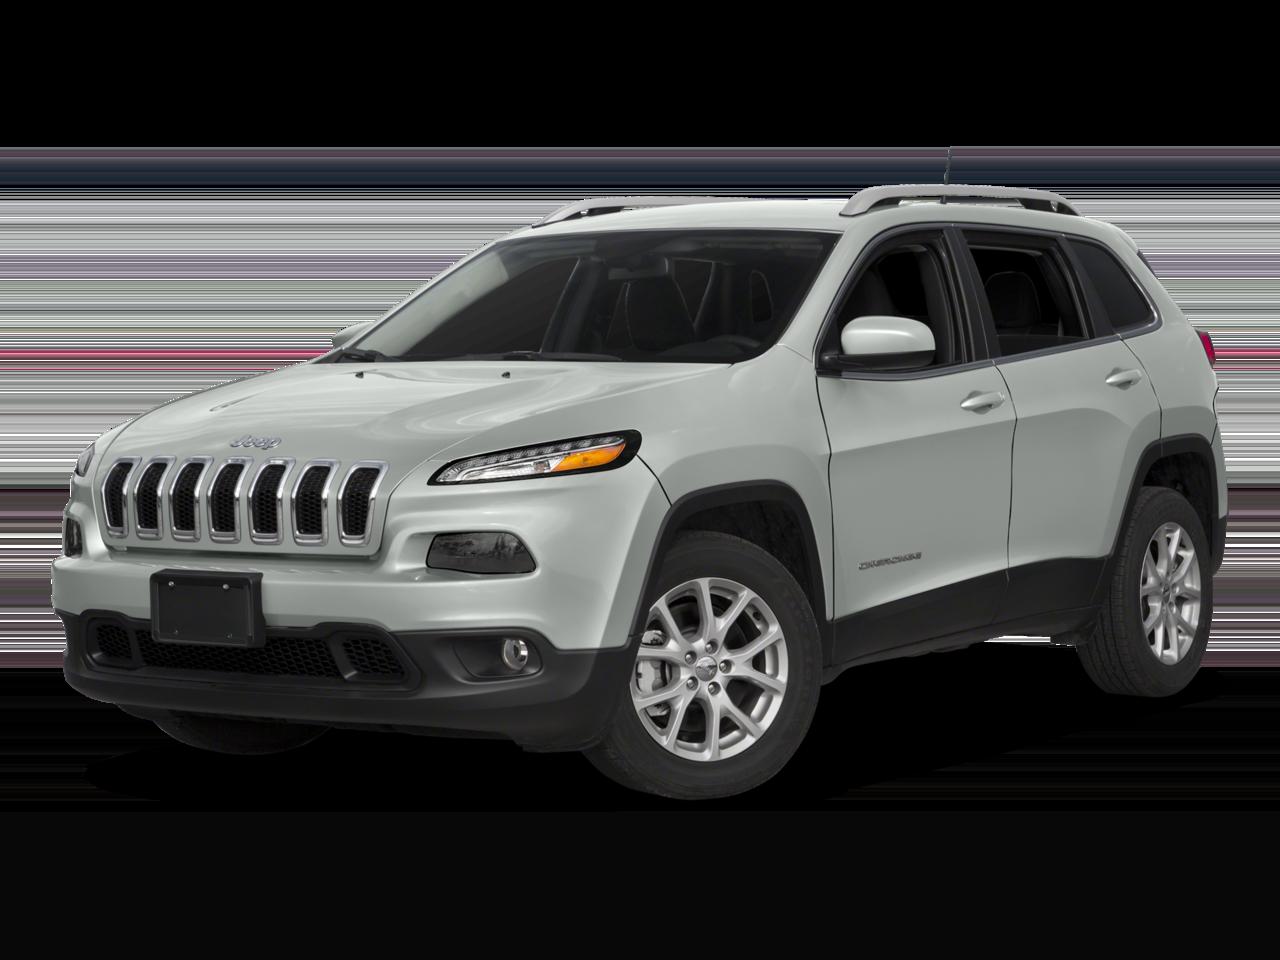 2019 Jeep Cherokee Configurations.